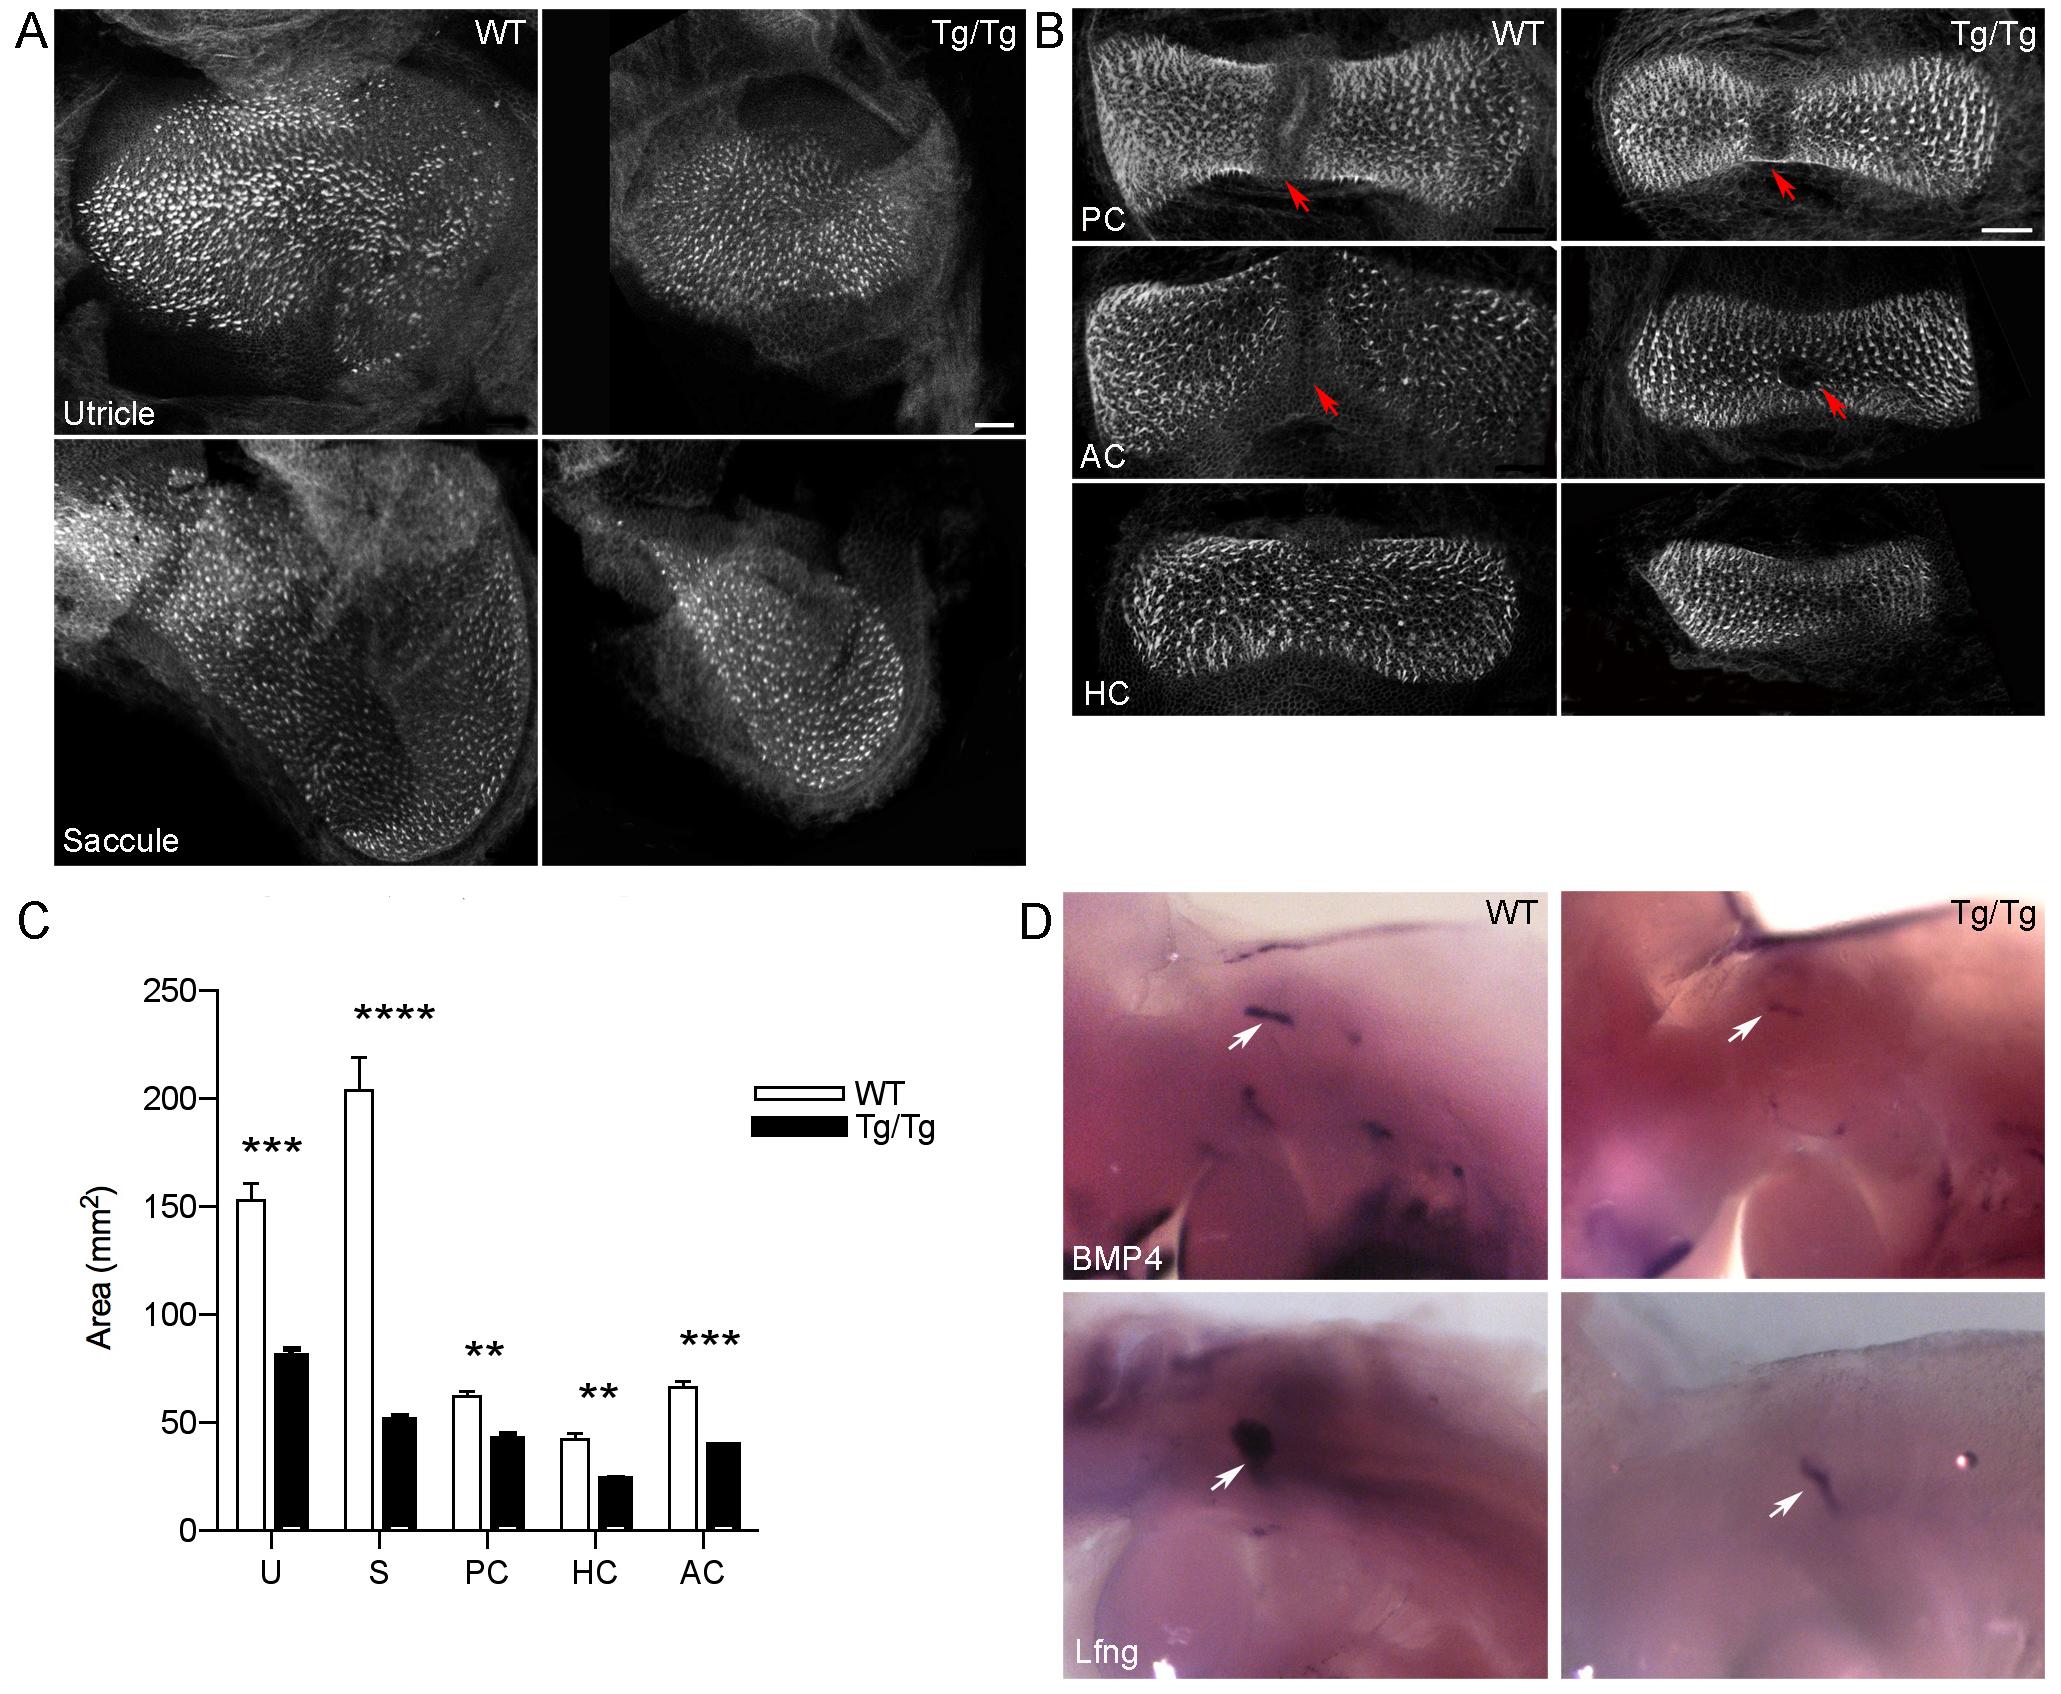 Mutation of <i>Sfswap</i> causes smaller vestibular cristae and maculae and misplaced eminentia cruciata.